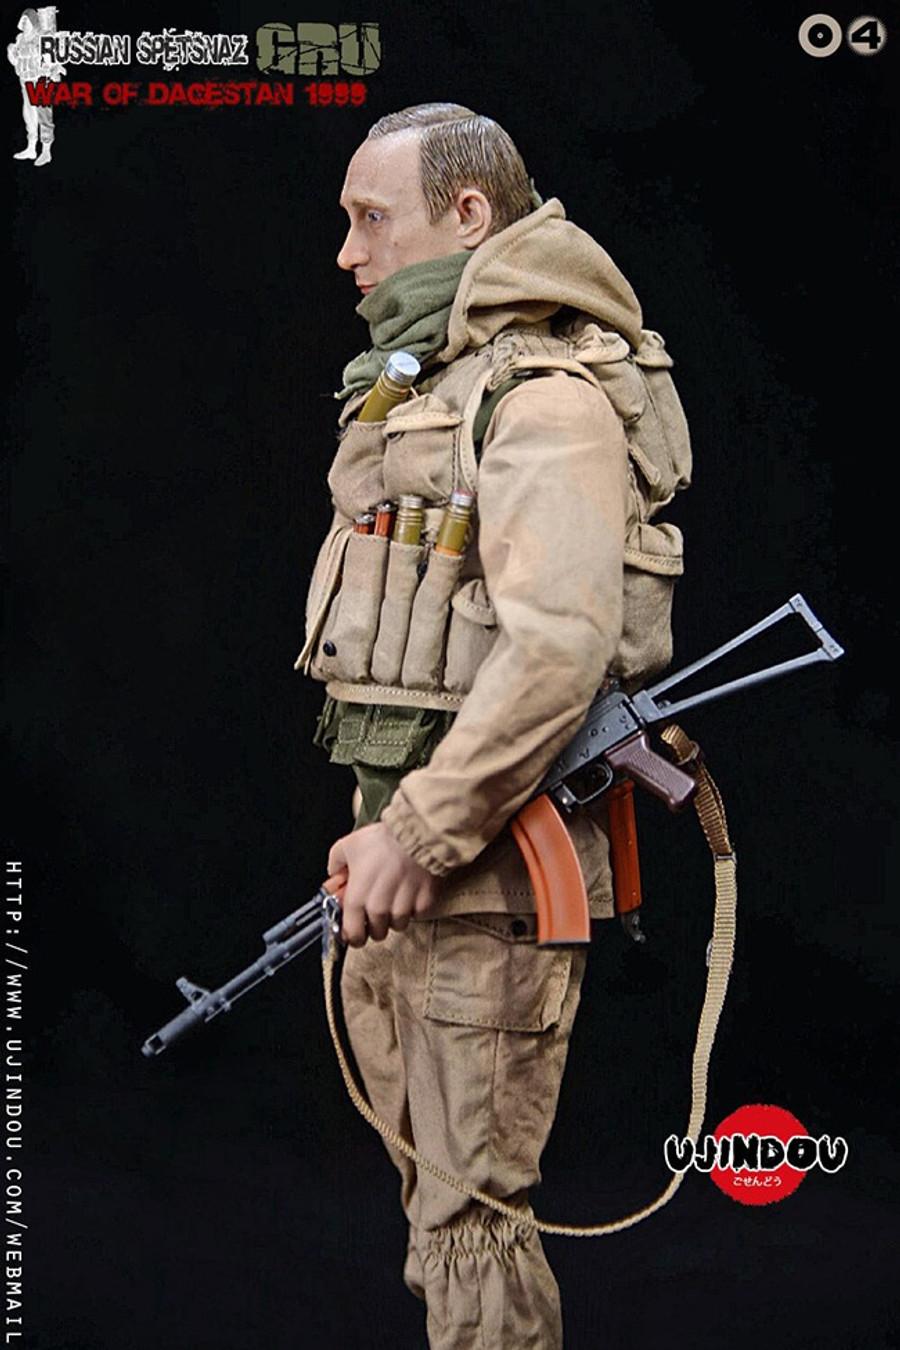 UJINDOU - Russian Spetsnaz GRU War Of Dagestan 1999